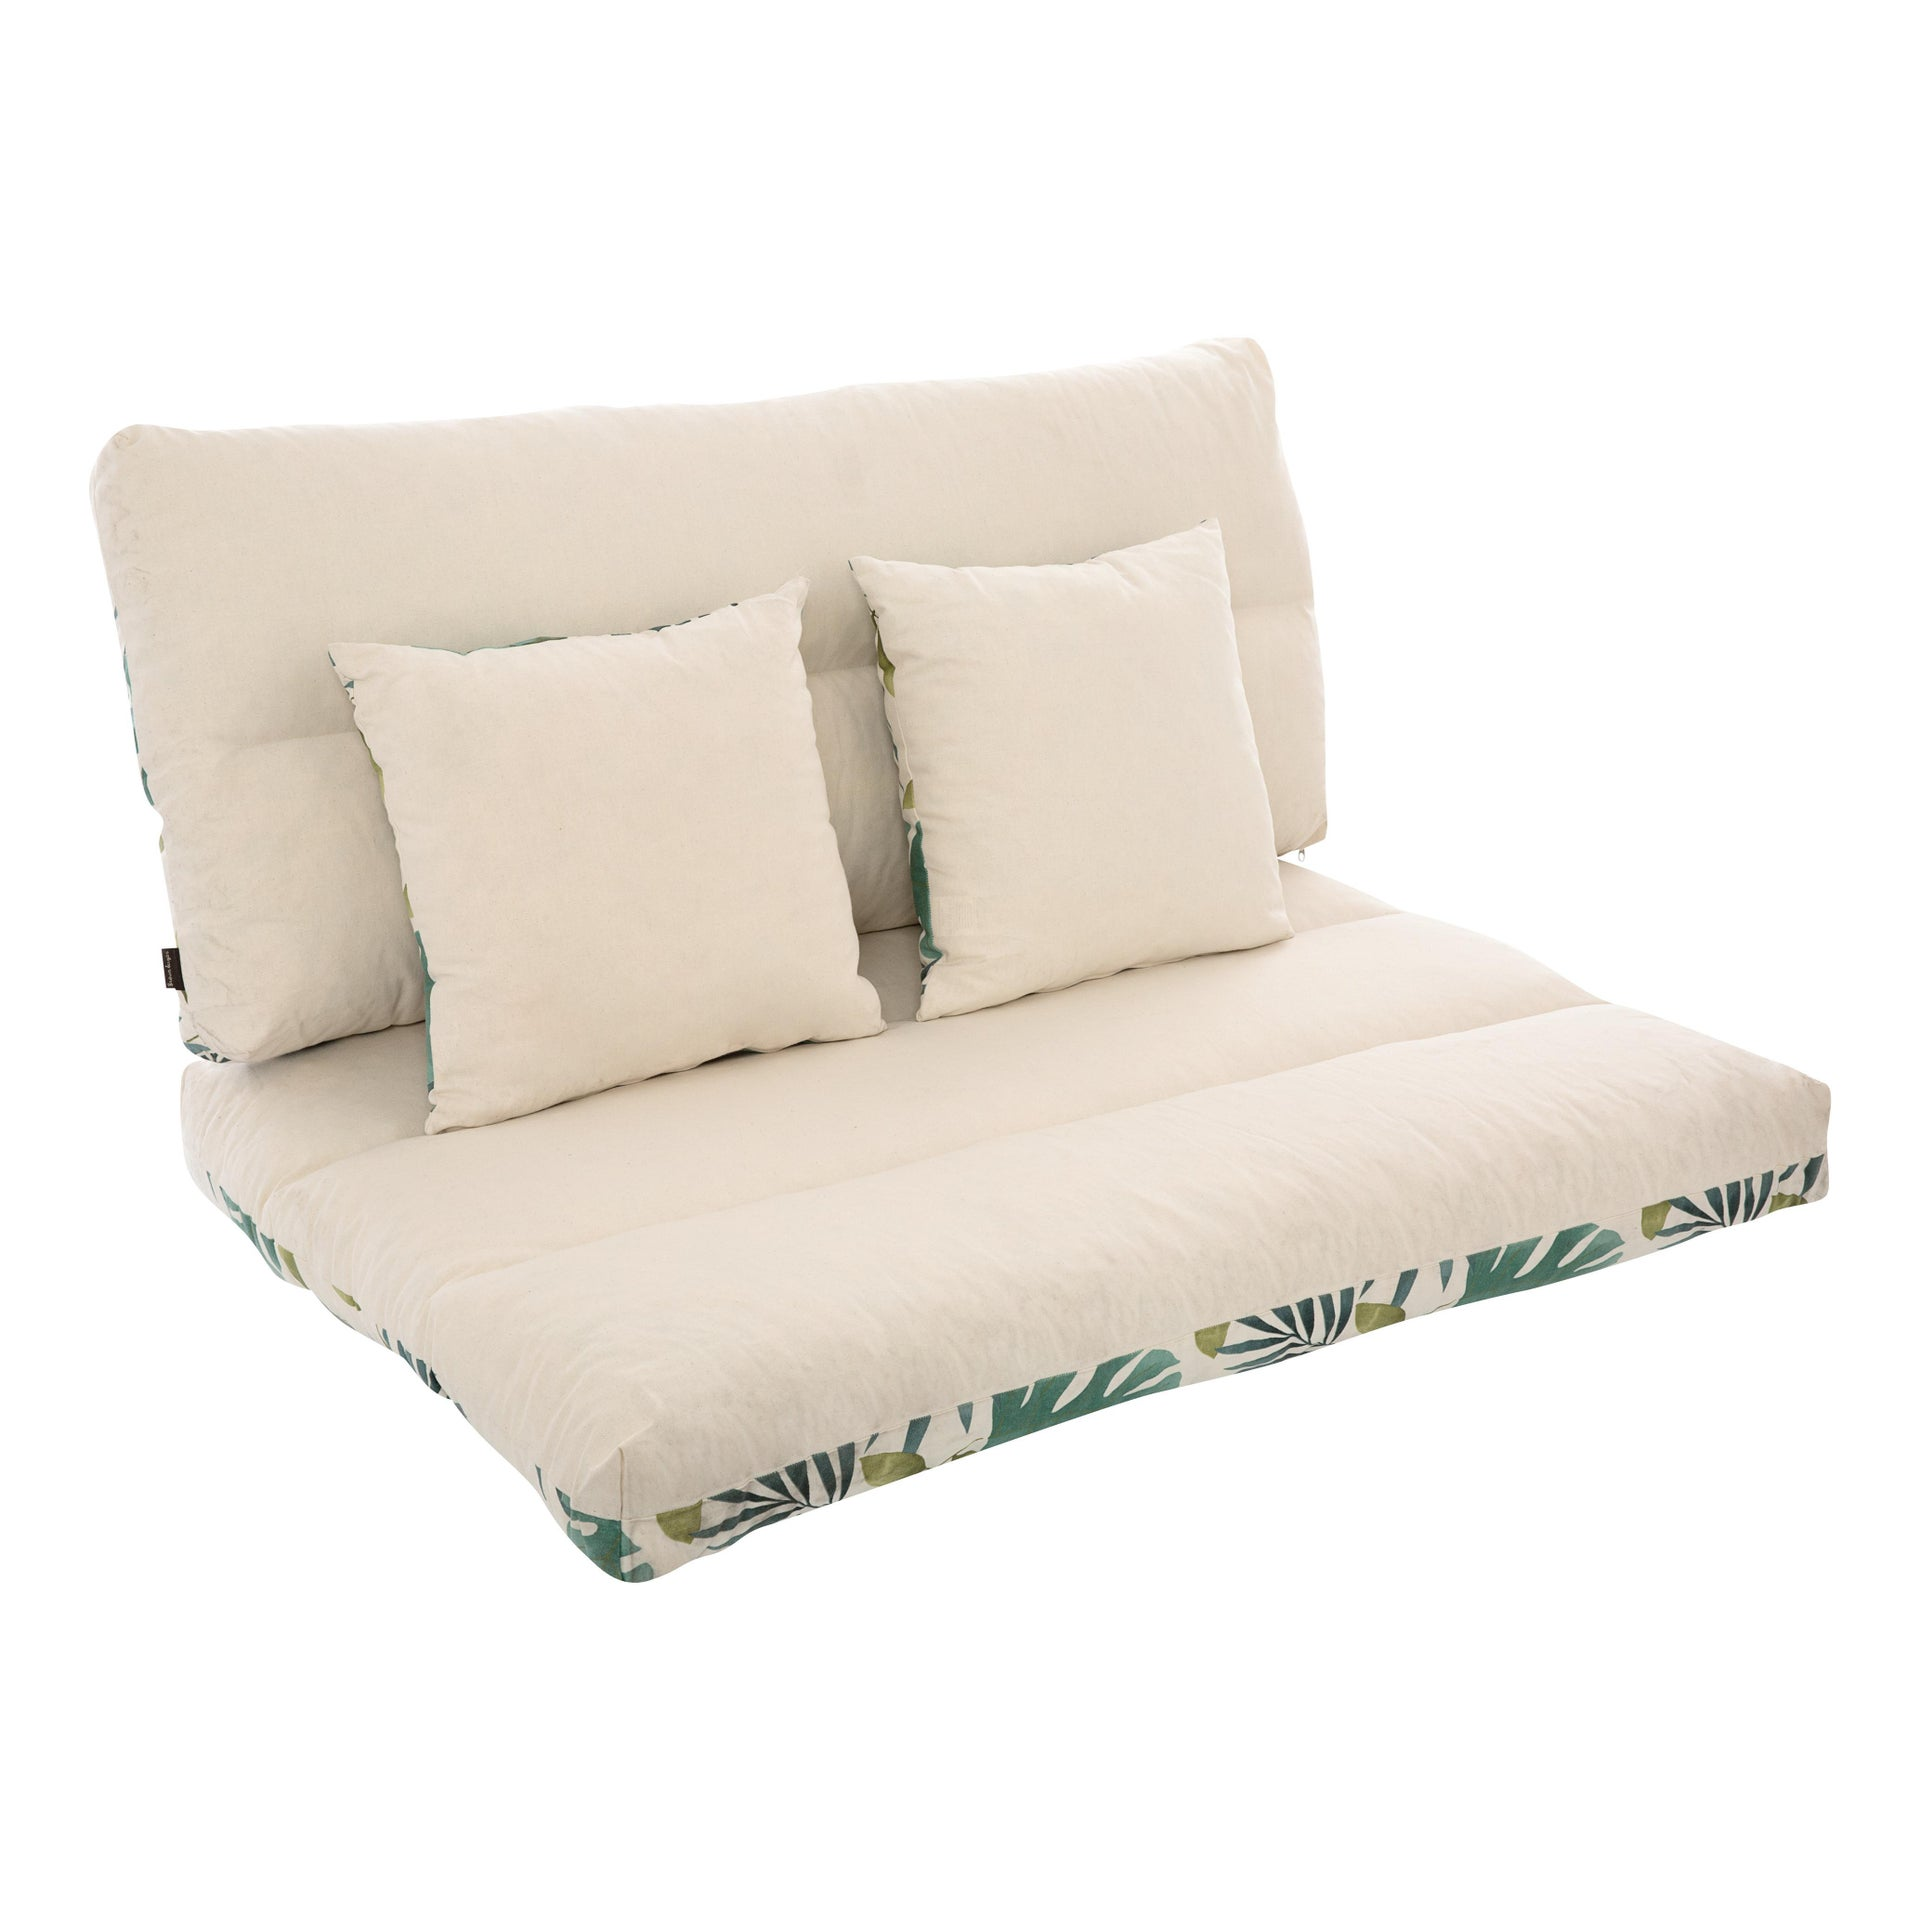 Cuscino da esterno BRASILE multicolore 120 x 80 x Sp 80 cm , 4 pezzi - 9